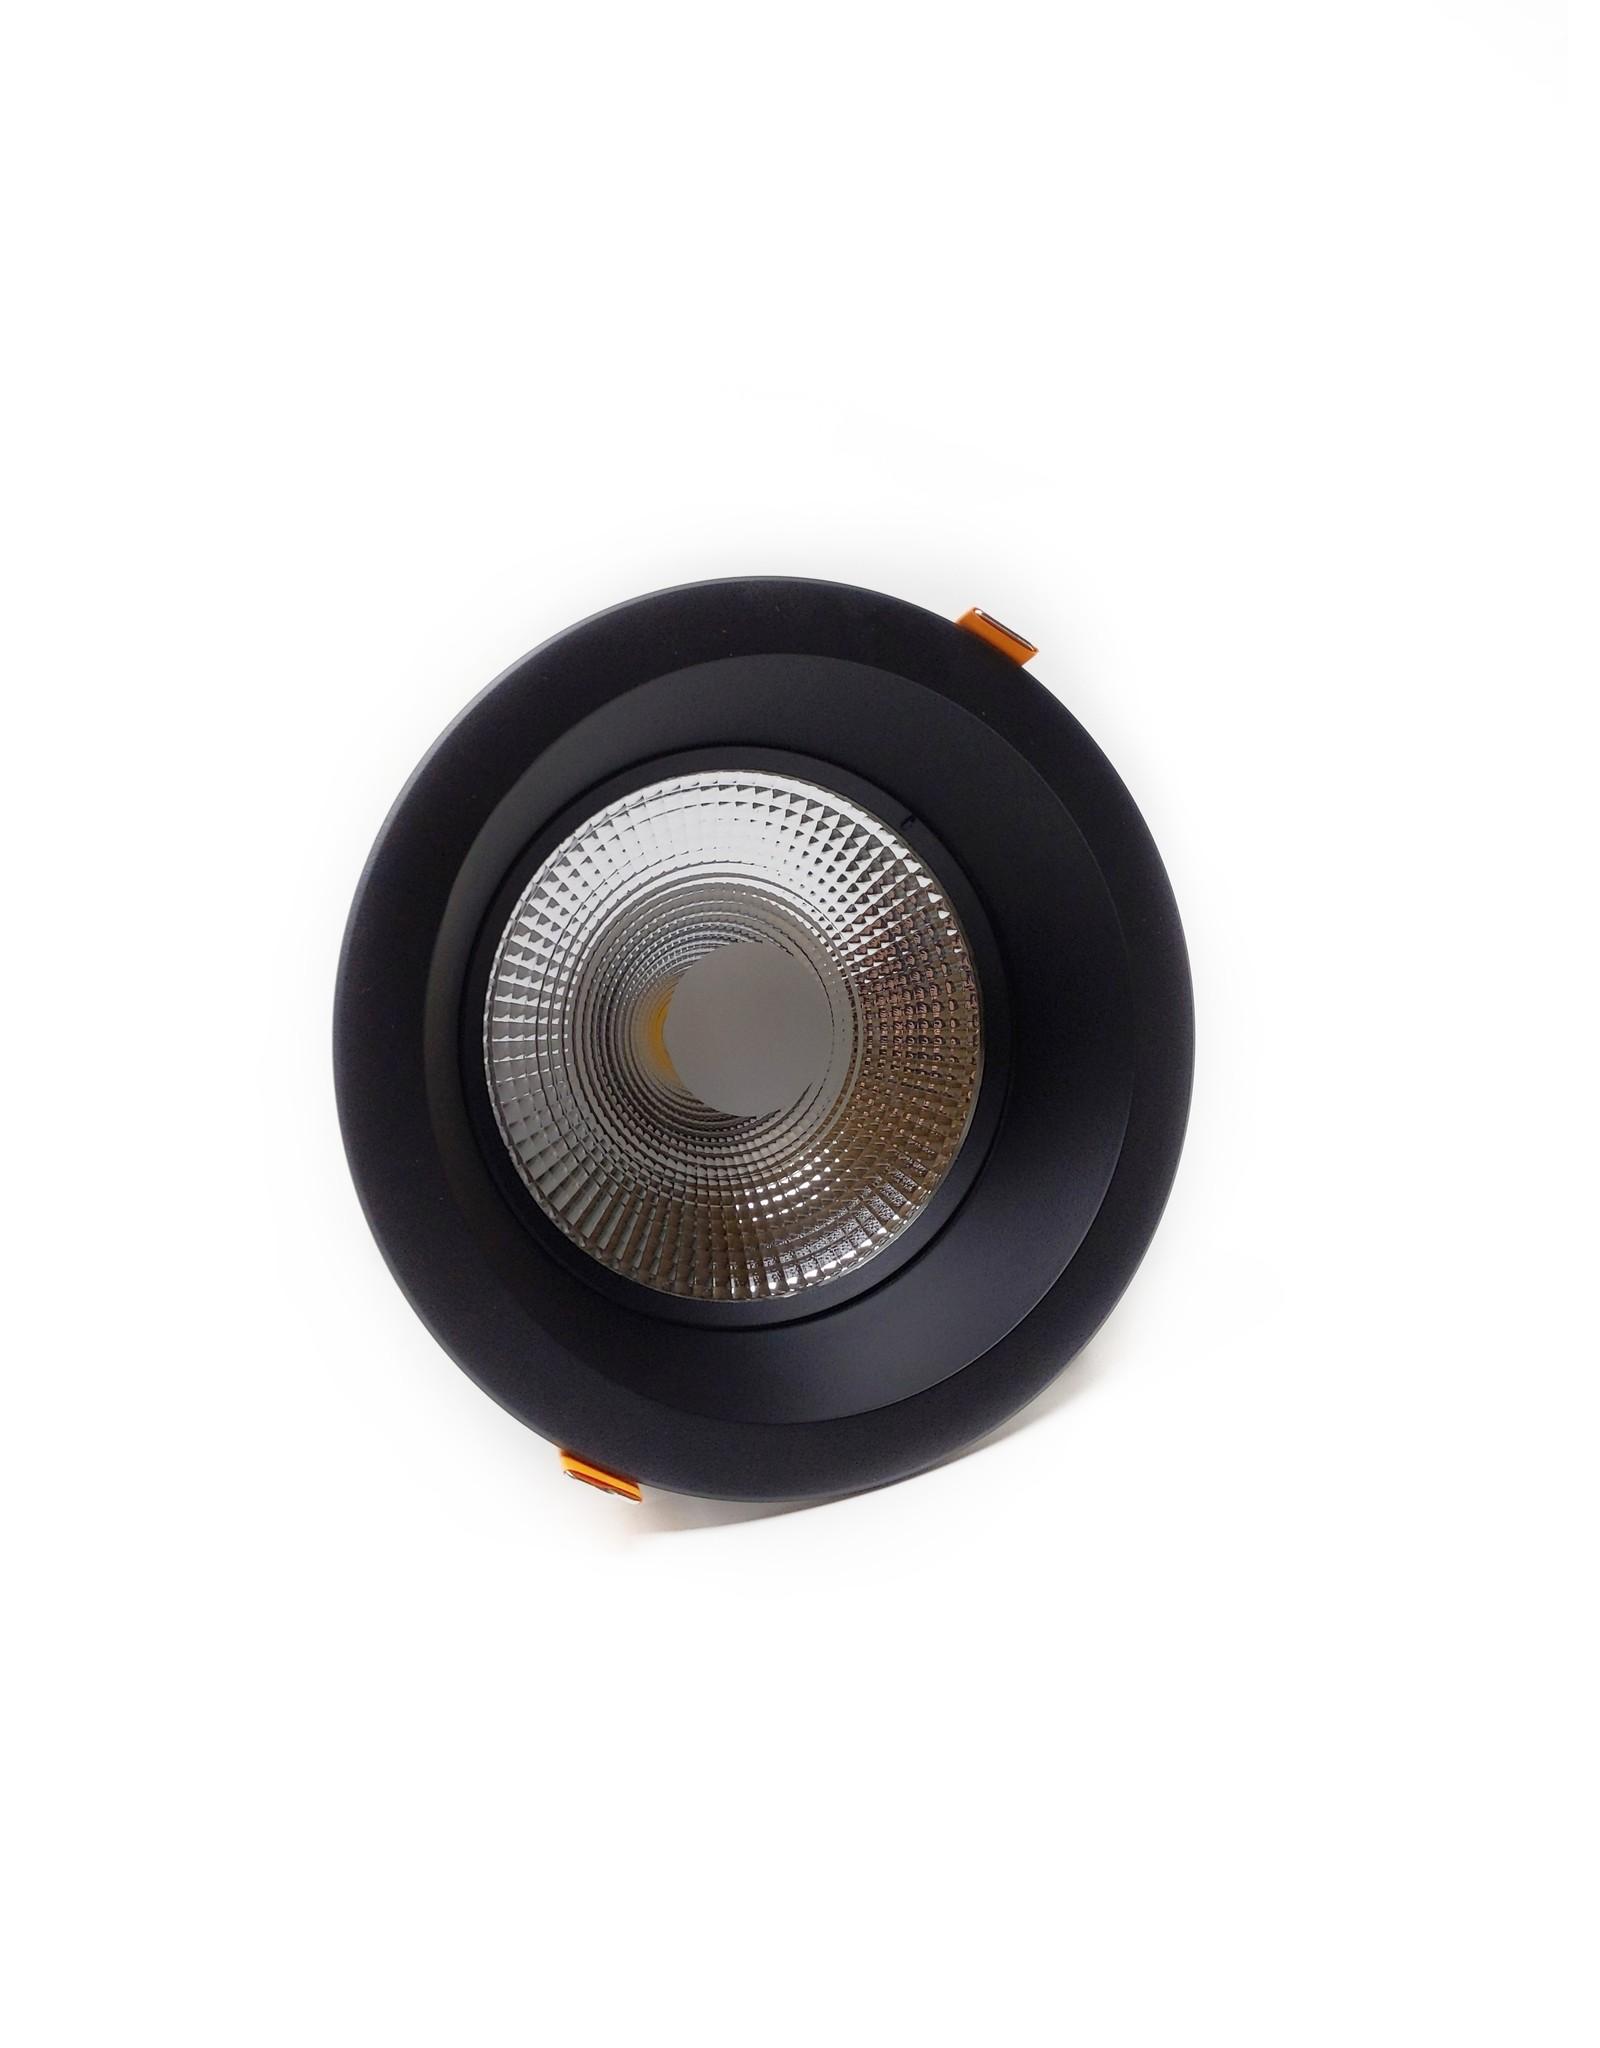 LedLed Glare Dowlight ZWART 3000k 192mm 8-20W gatmaat 165mm